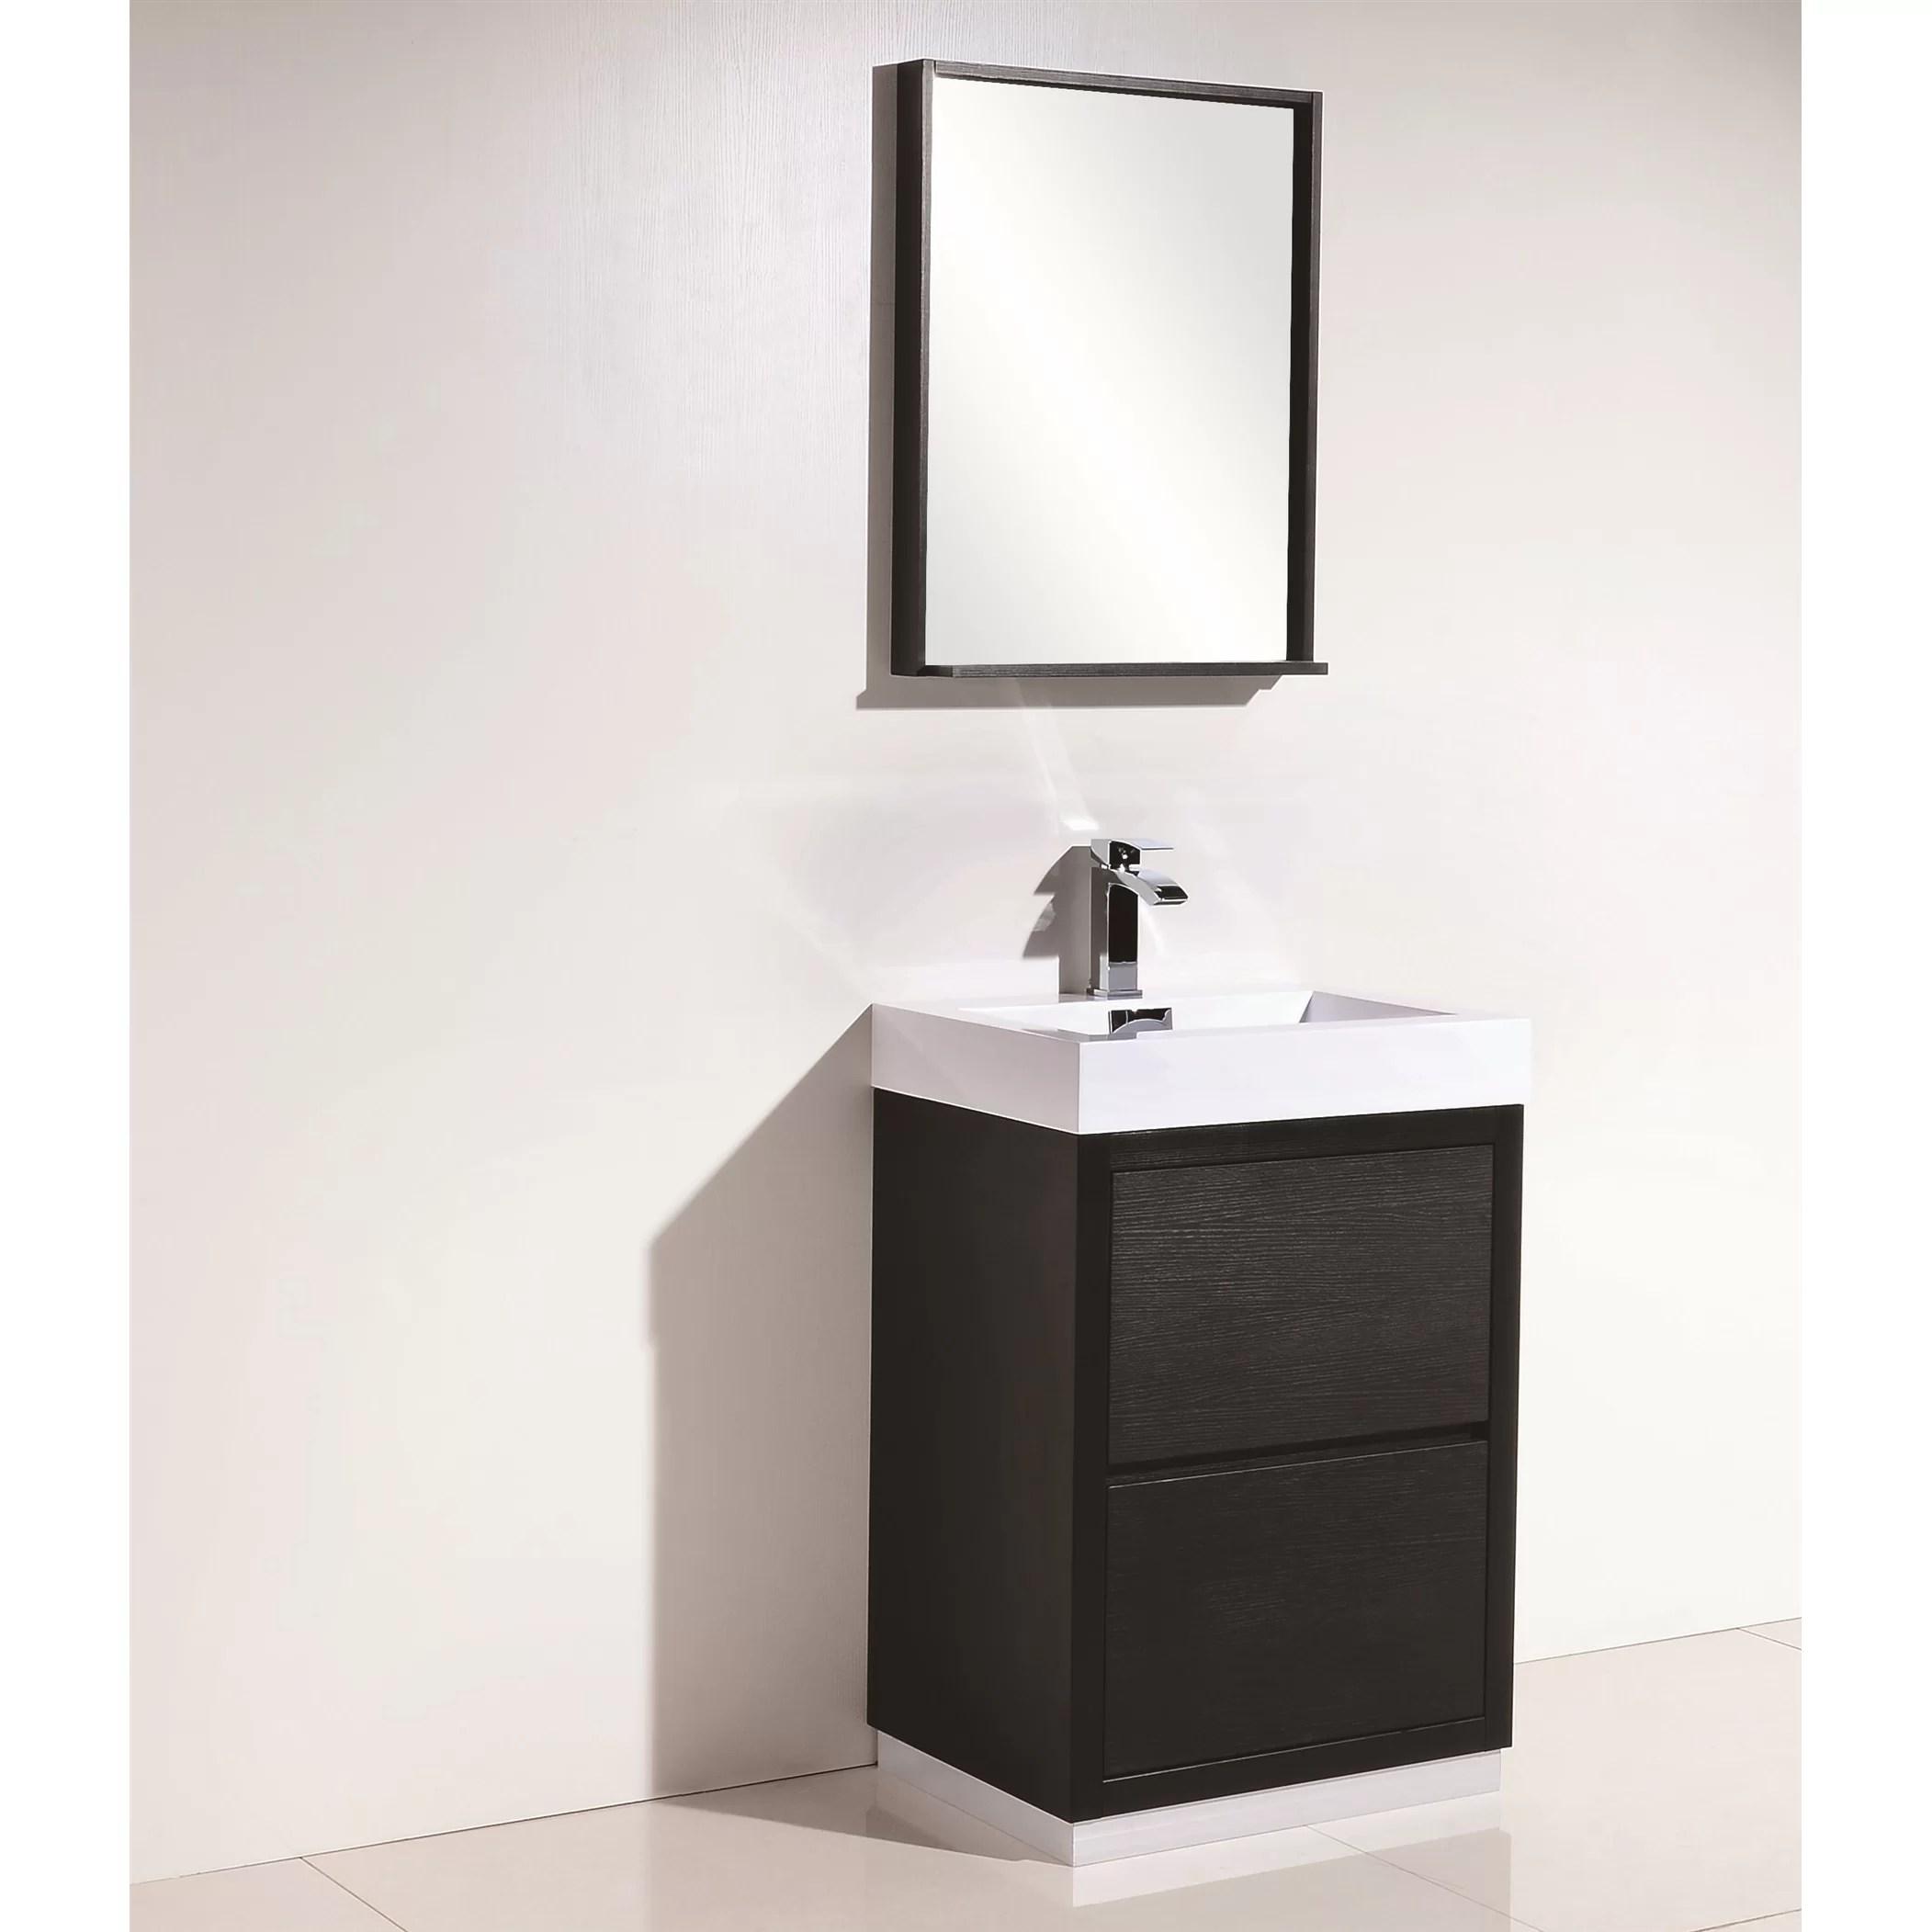 Kube Bath Bliss 24 Single Free Standing Modern Bathroom